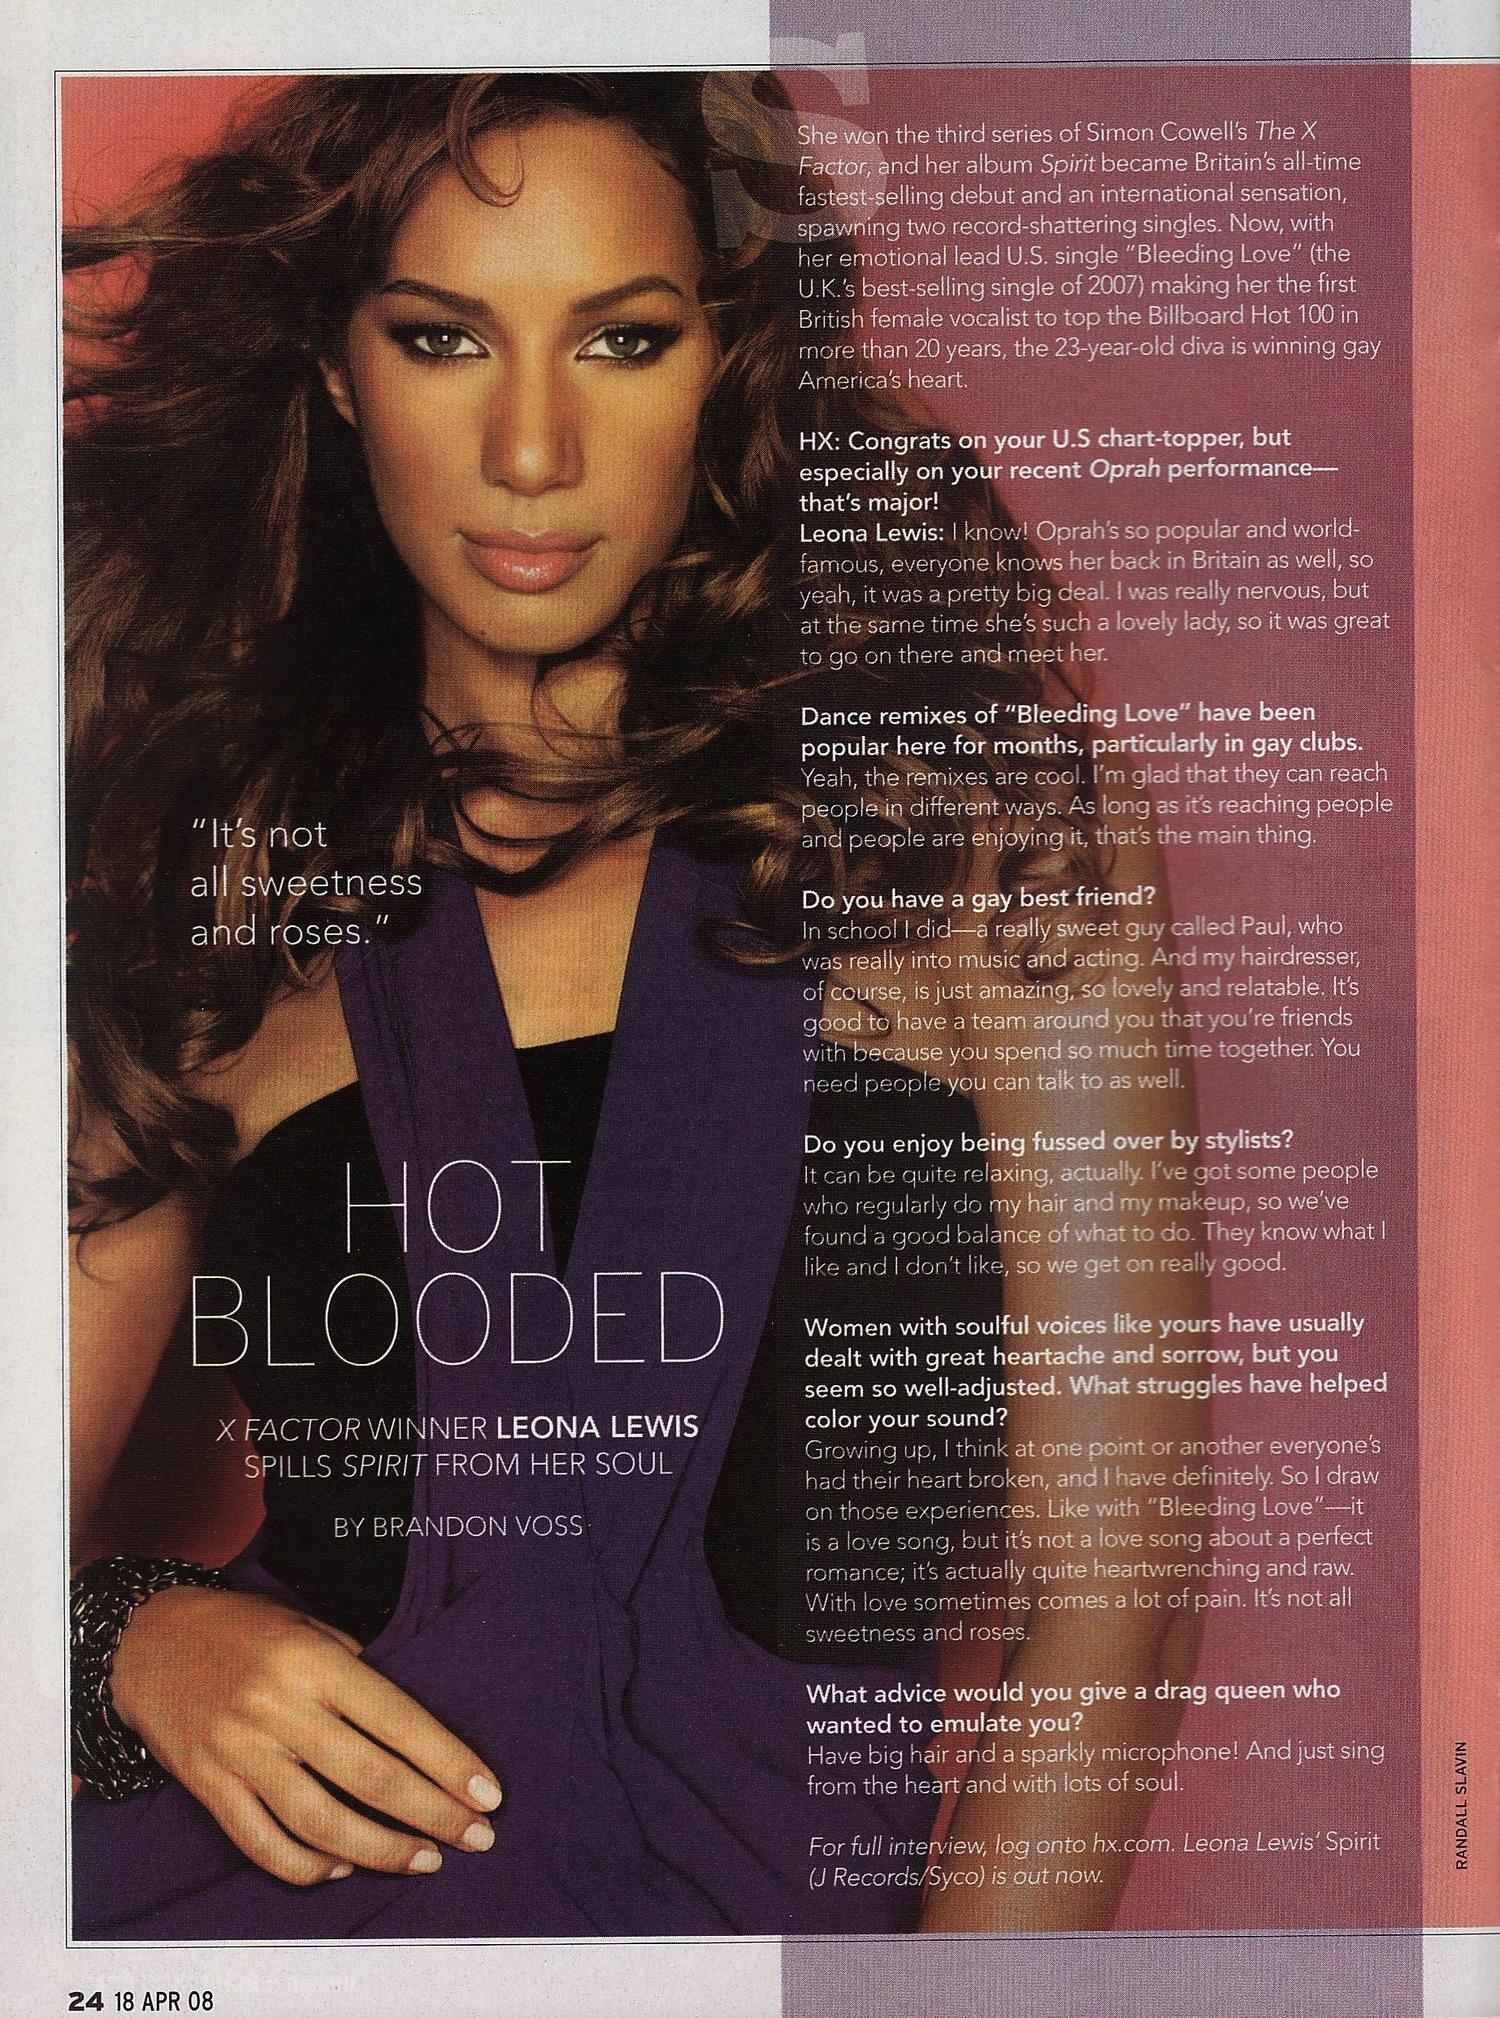 Leona Lewis: Hot Blooded — Brandon Voss